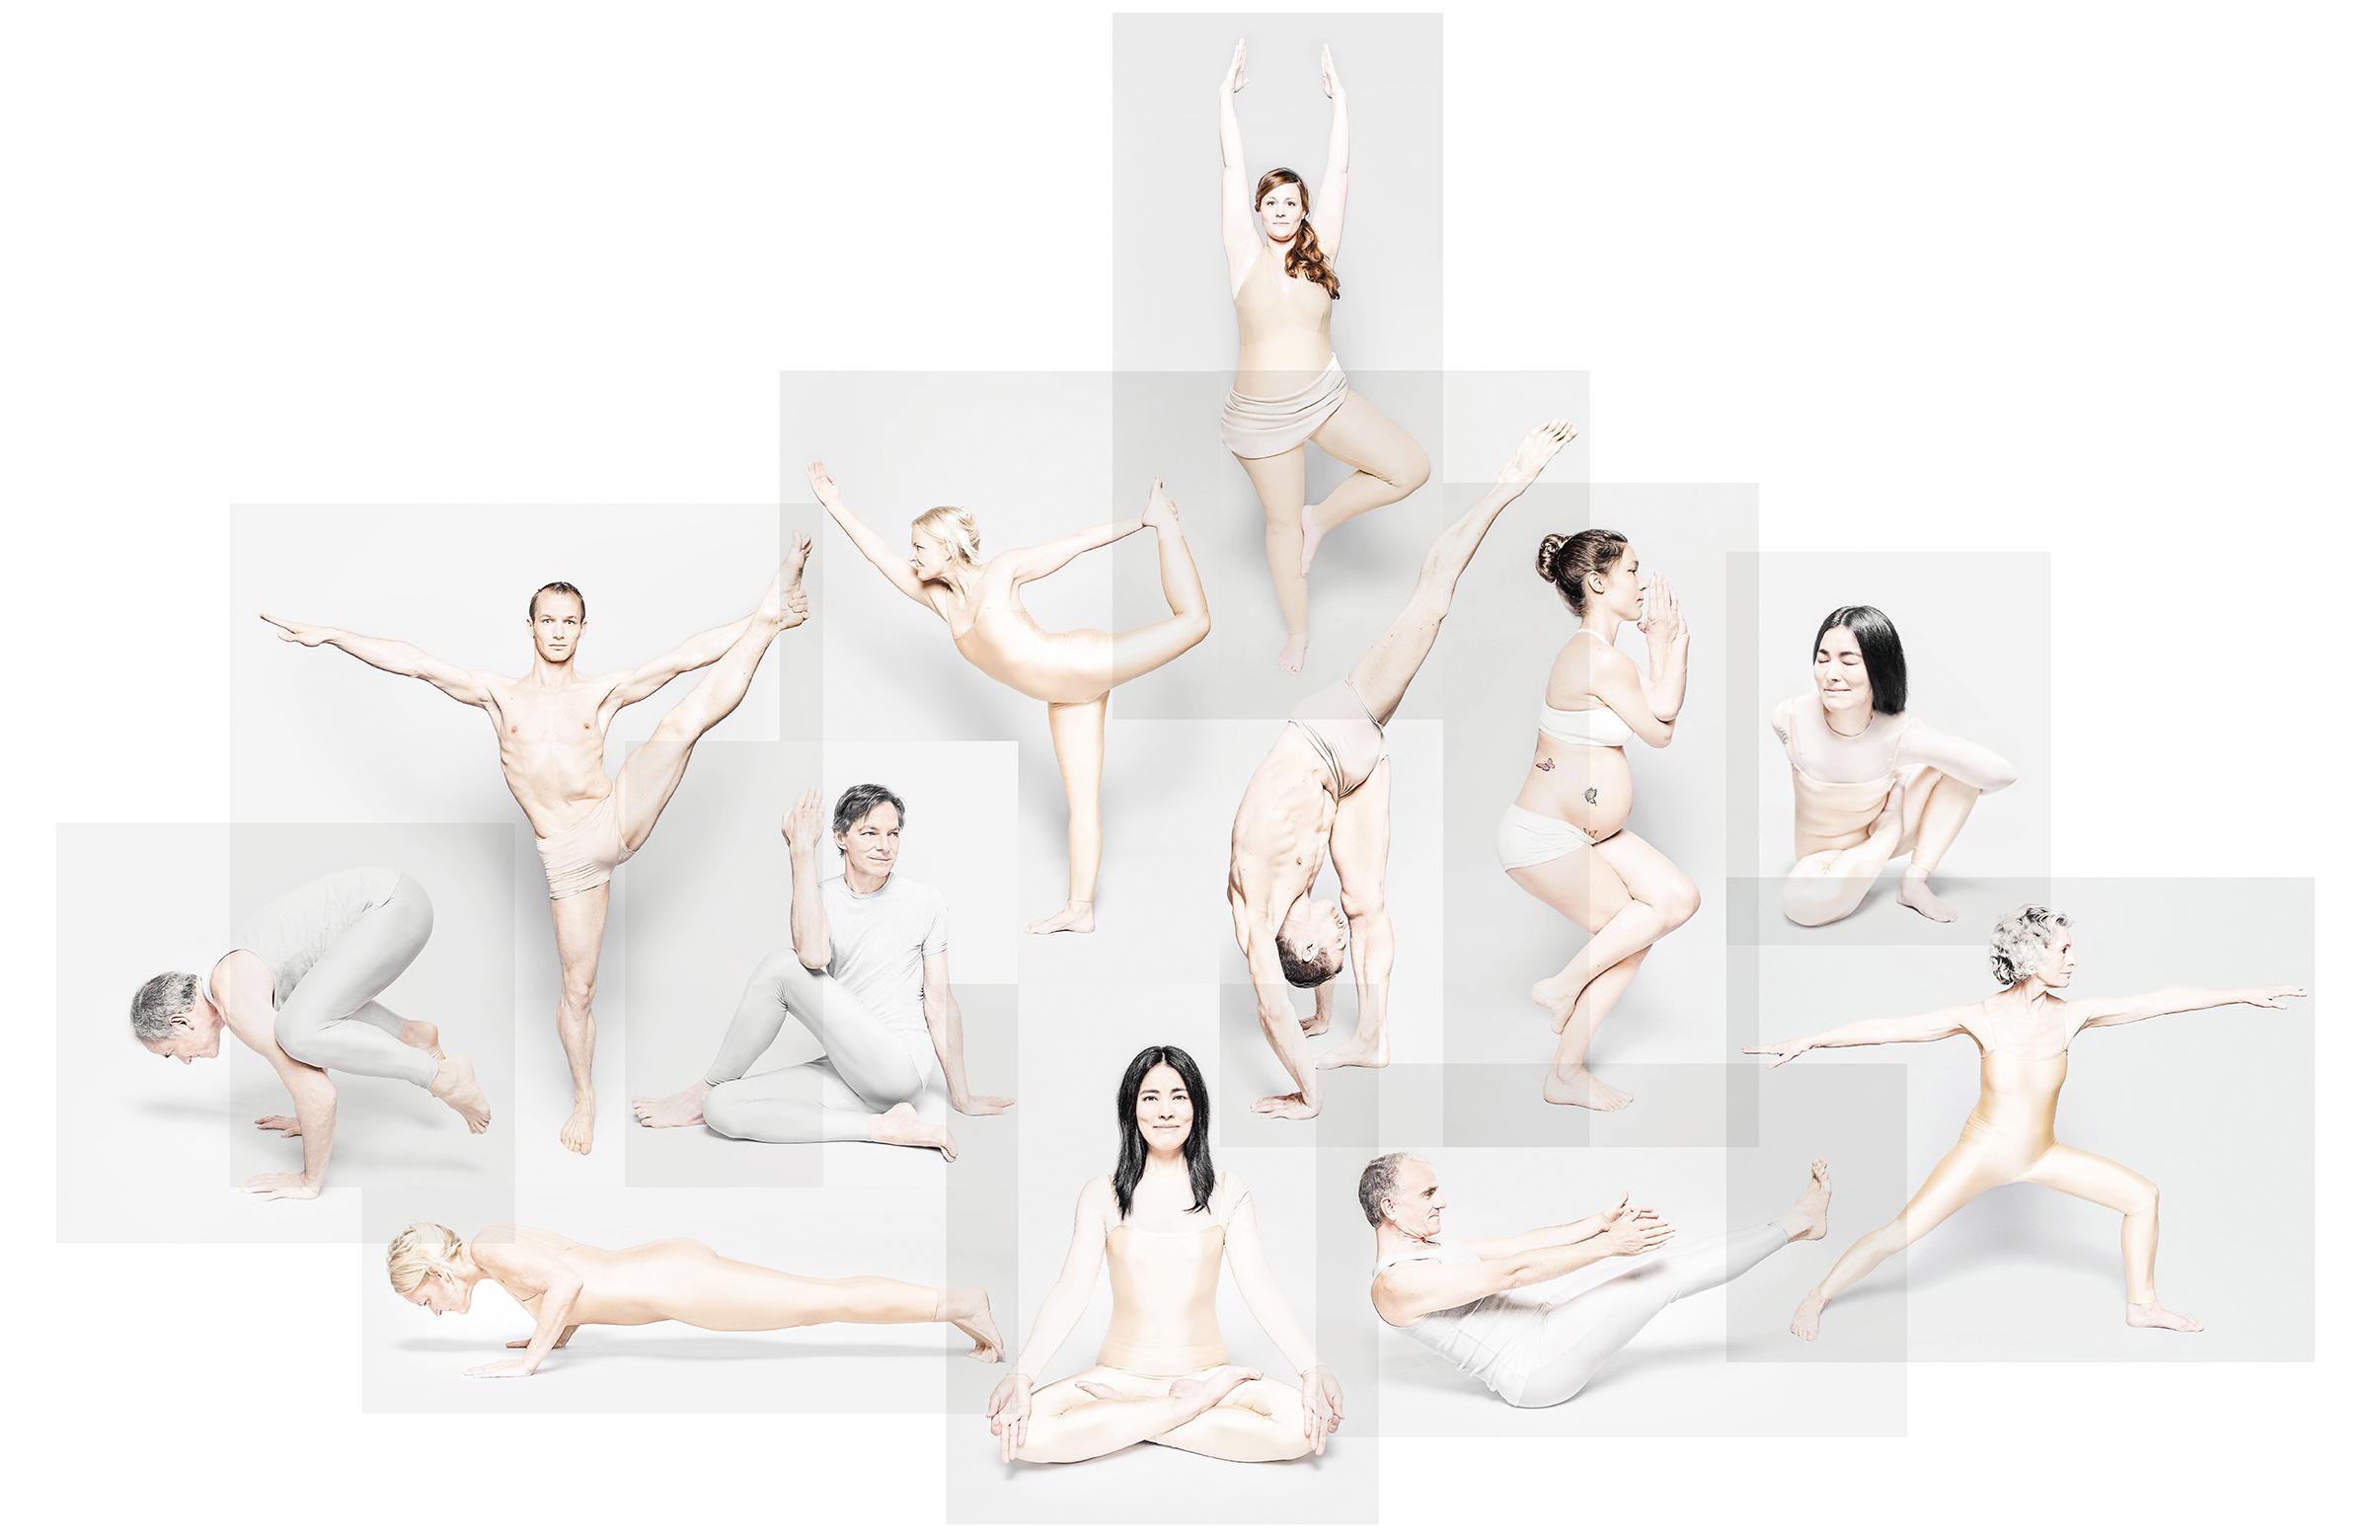 Susanne_Yoga_fin14website.jpg